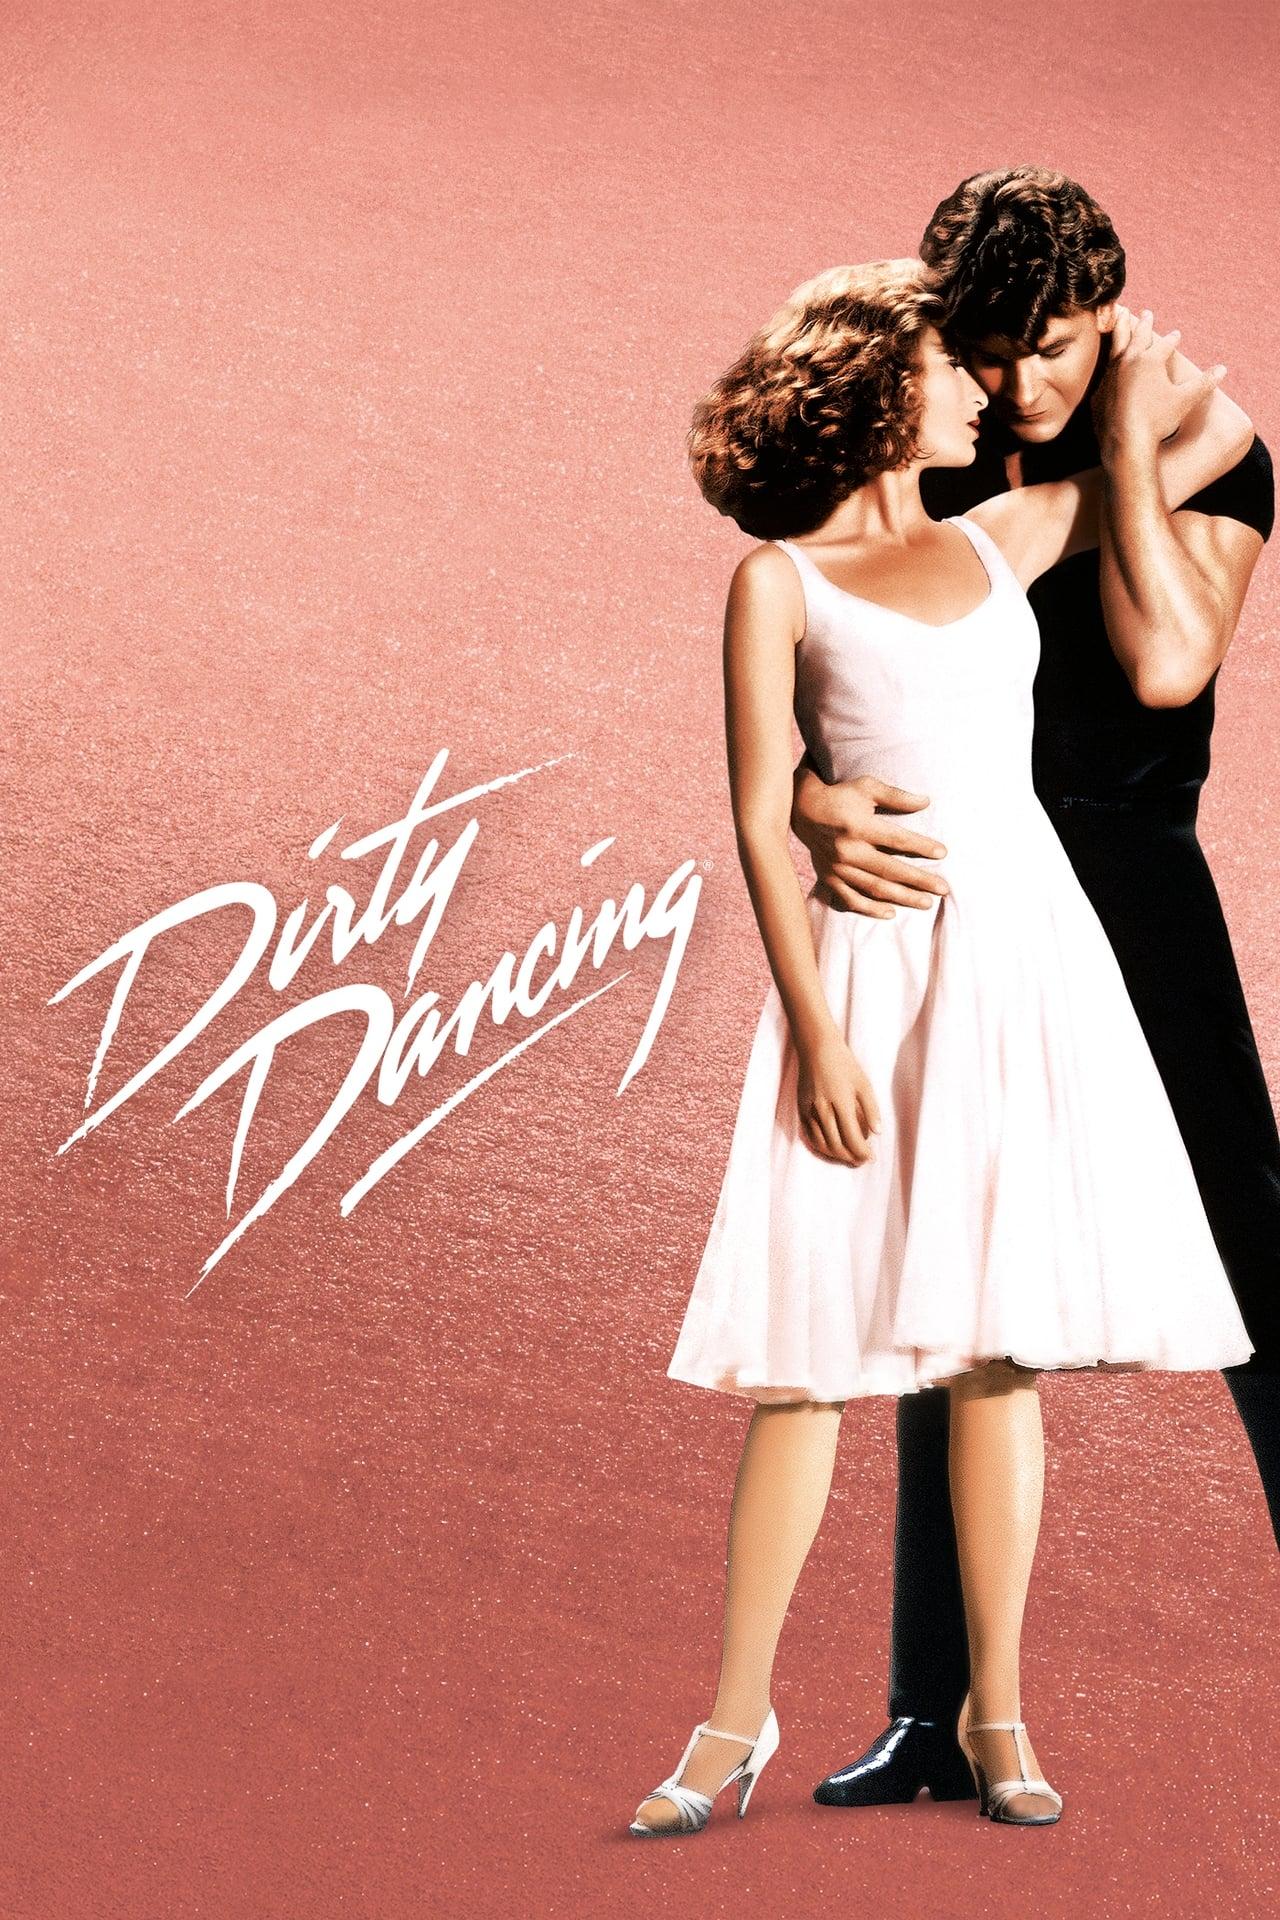 Dirty Dancing Stream English